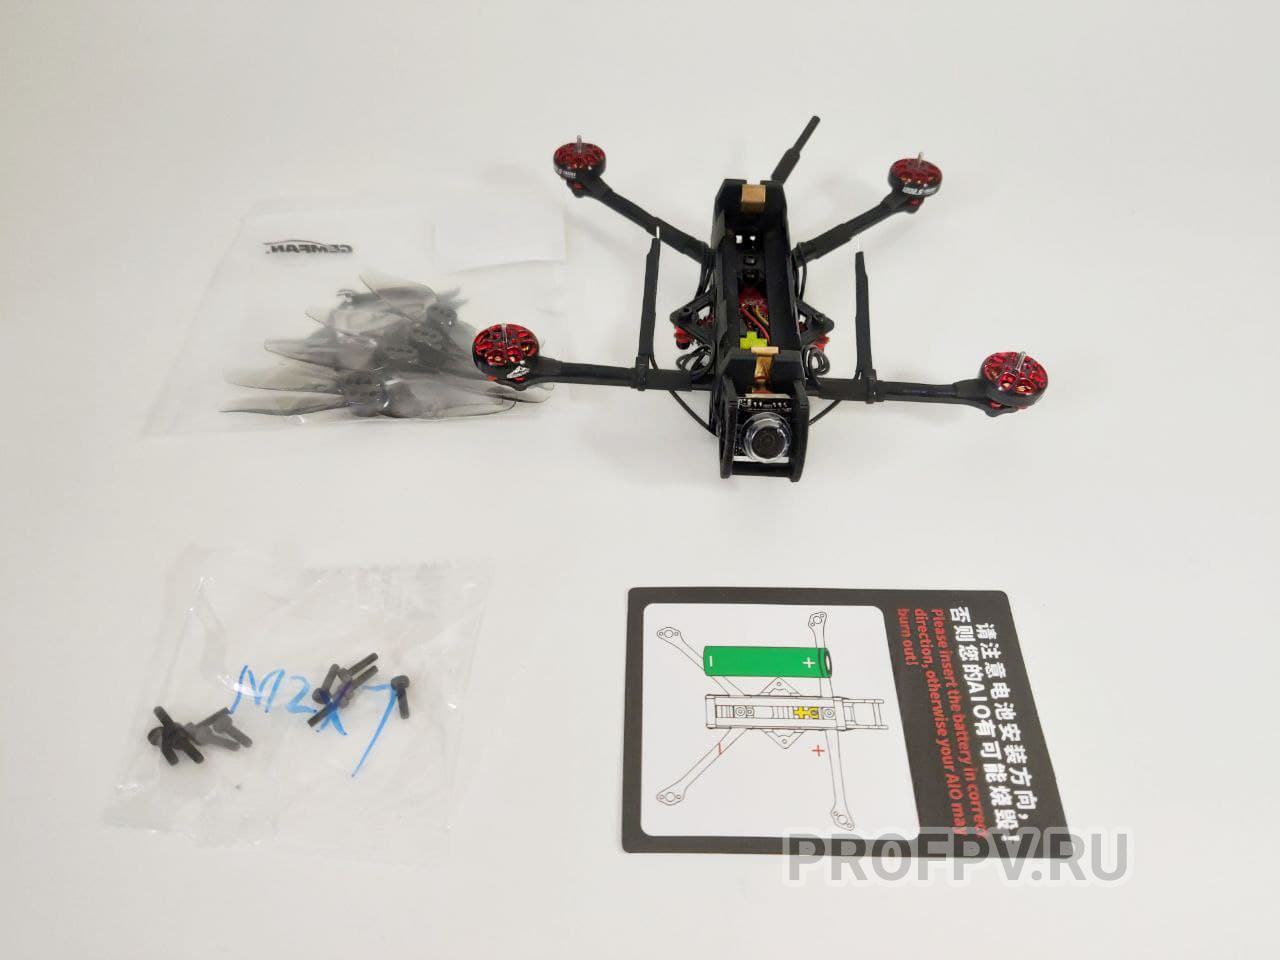 Обзор RekonFPV Rekon 3 Nano, микро дрон